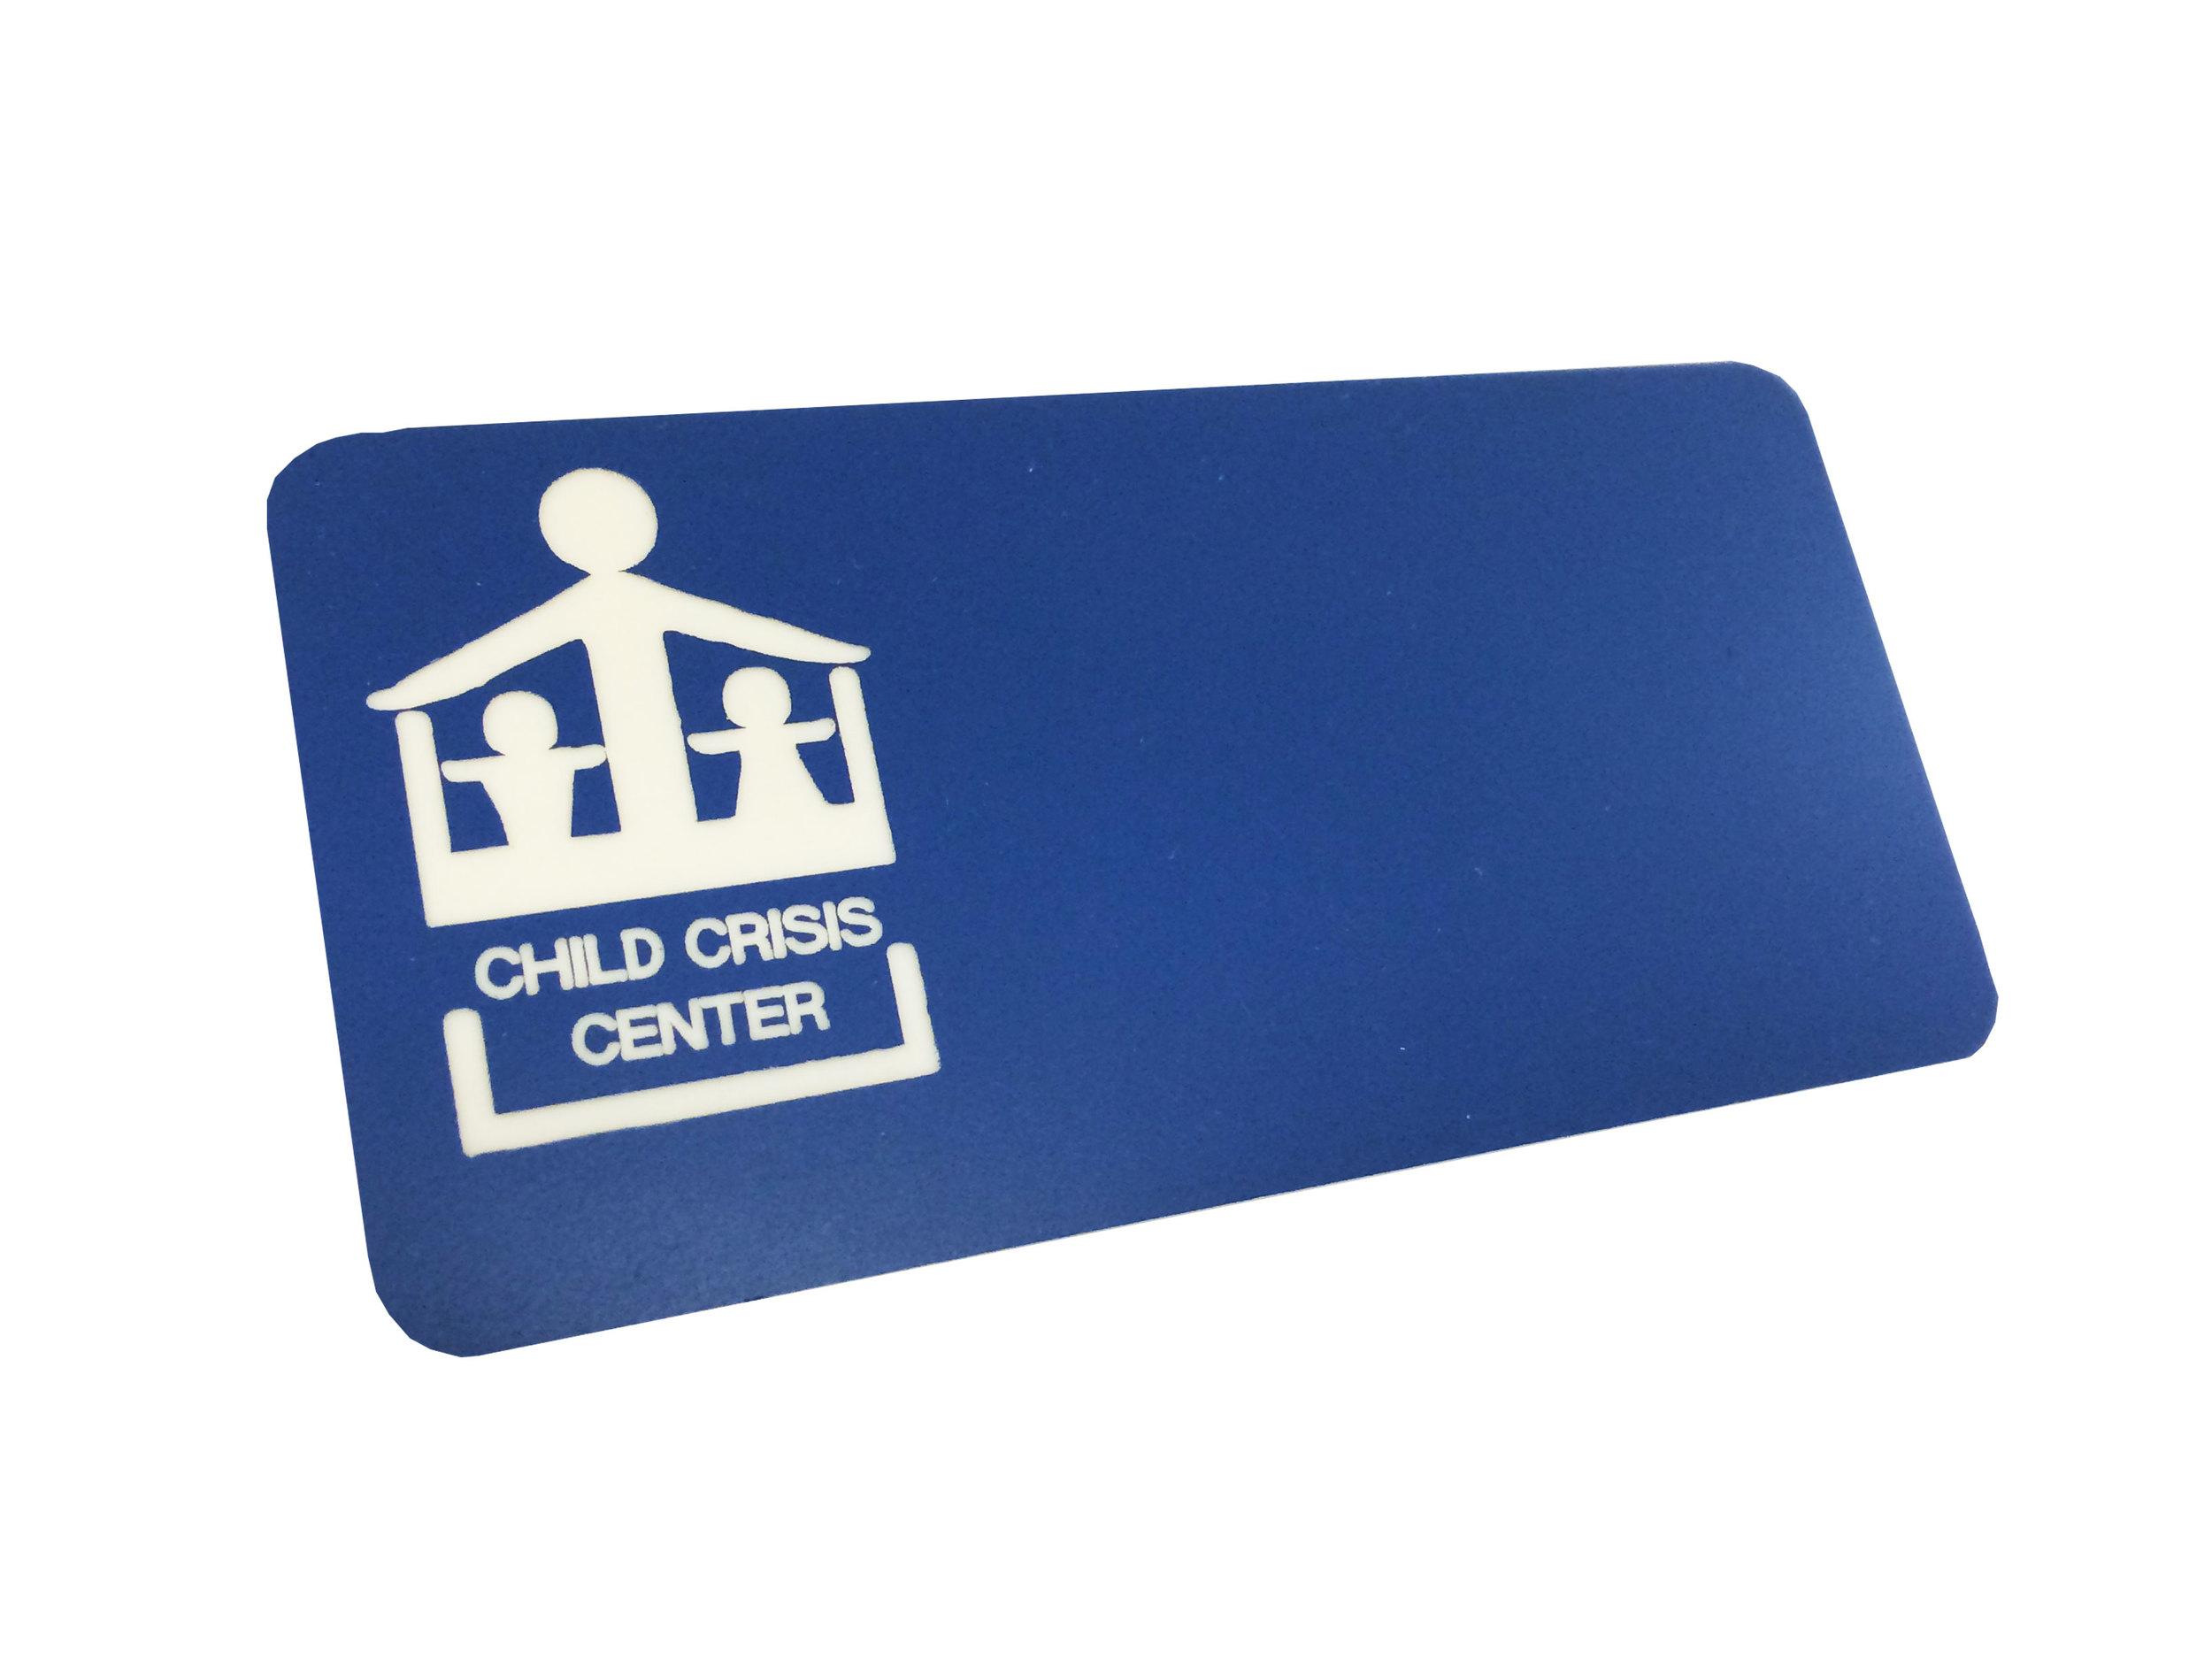 Engraved on Blue Plastic